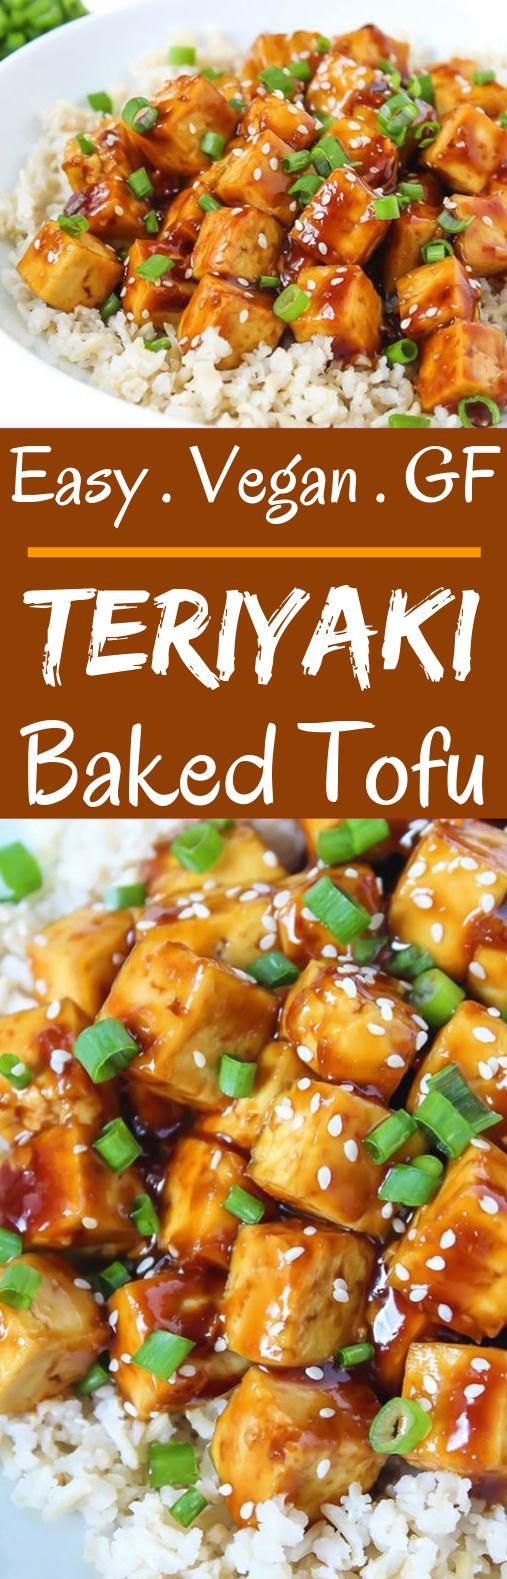 Teriyaki Baked Tofu #vegetarian #dinner